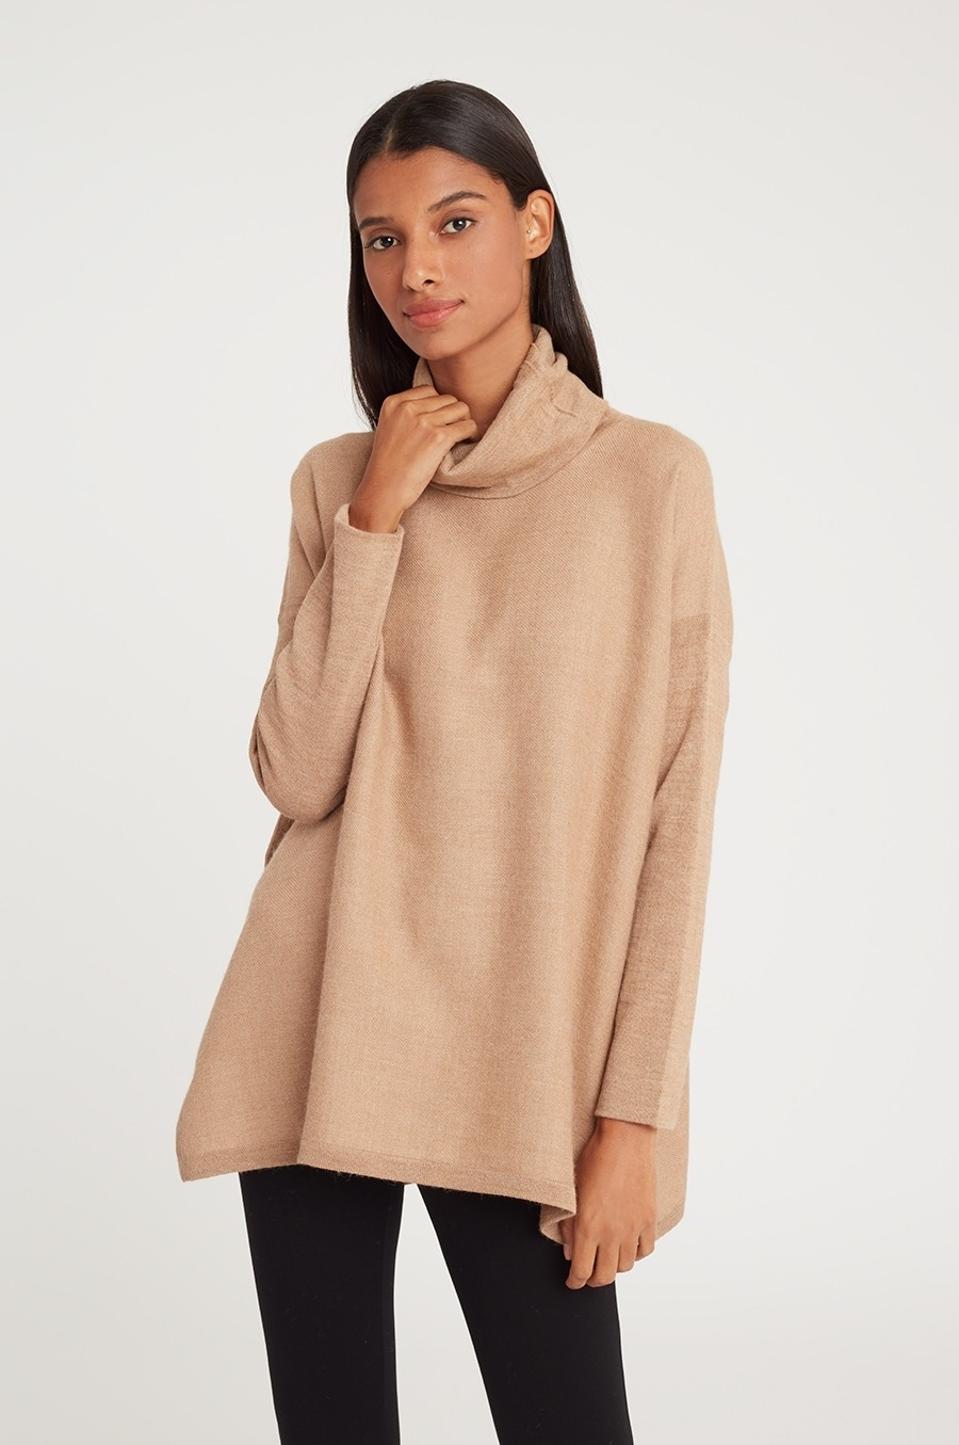 turtleneck, alpaca, wool, sweater